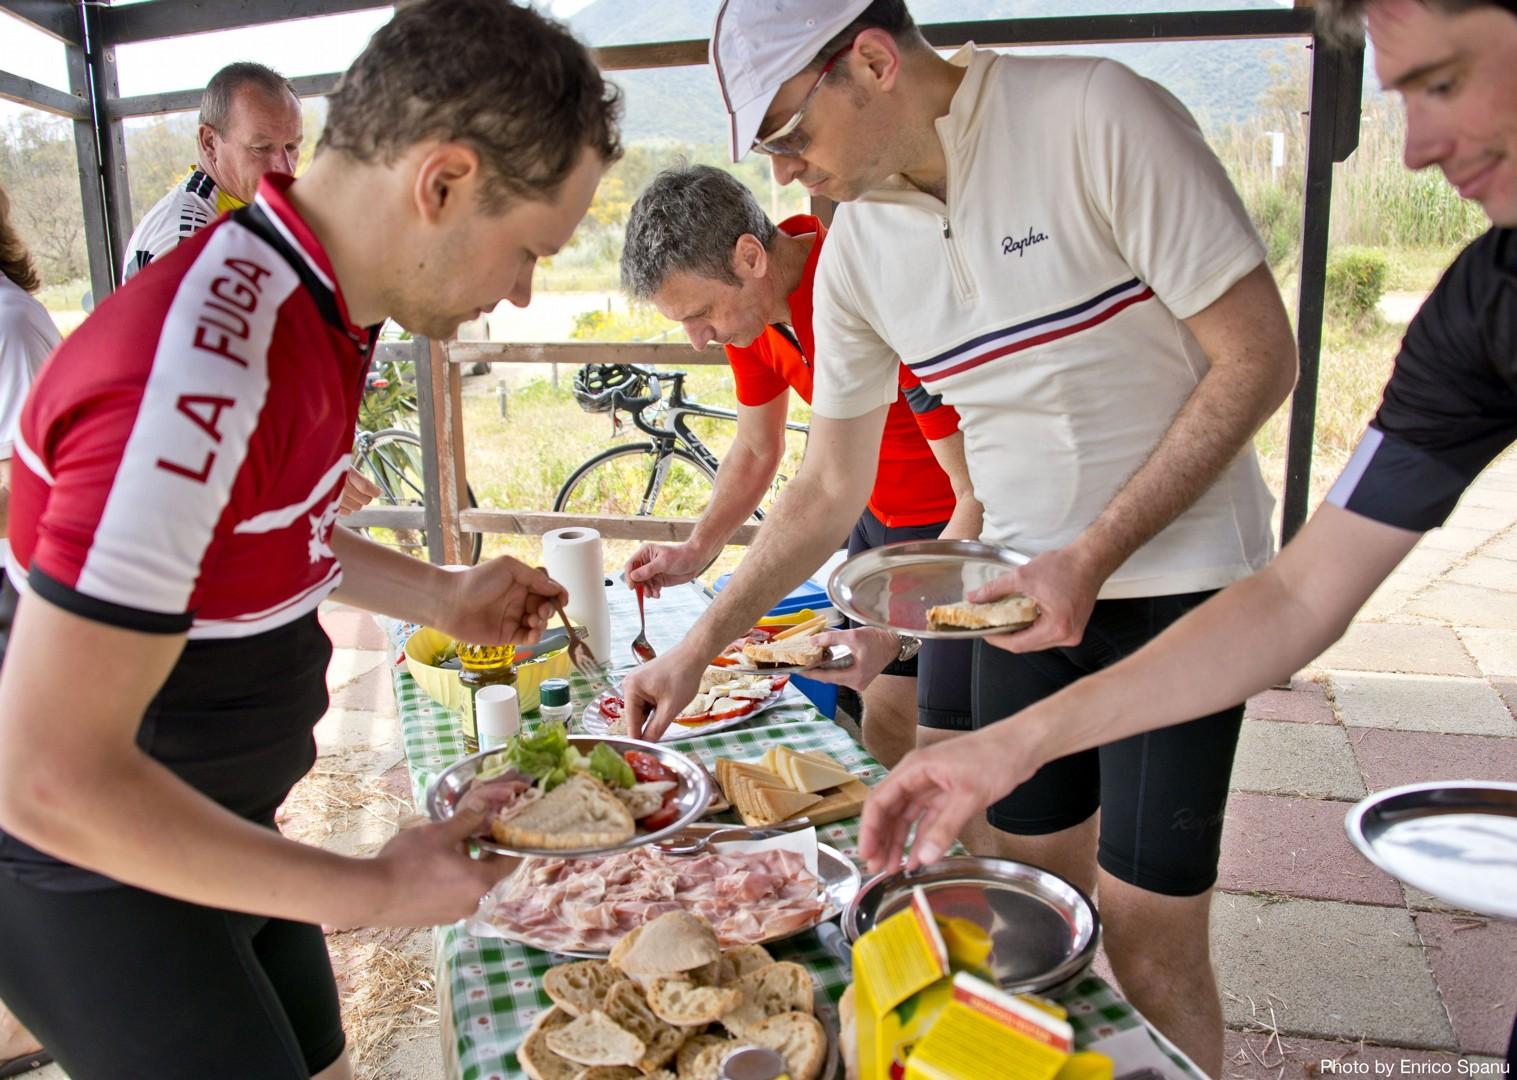 Guided-Road-Cycling-Holiday-Sardinia-Sardinian-Mountains-Flumendosa-Valley.jpg - Italy - Sardinia - Sardinian Mountains - Guided Road Cycling Holiday - Road Cycling